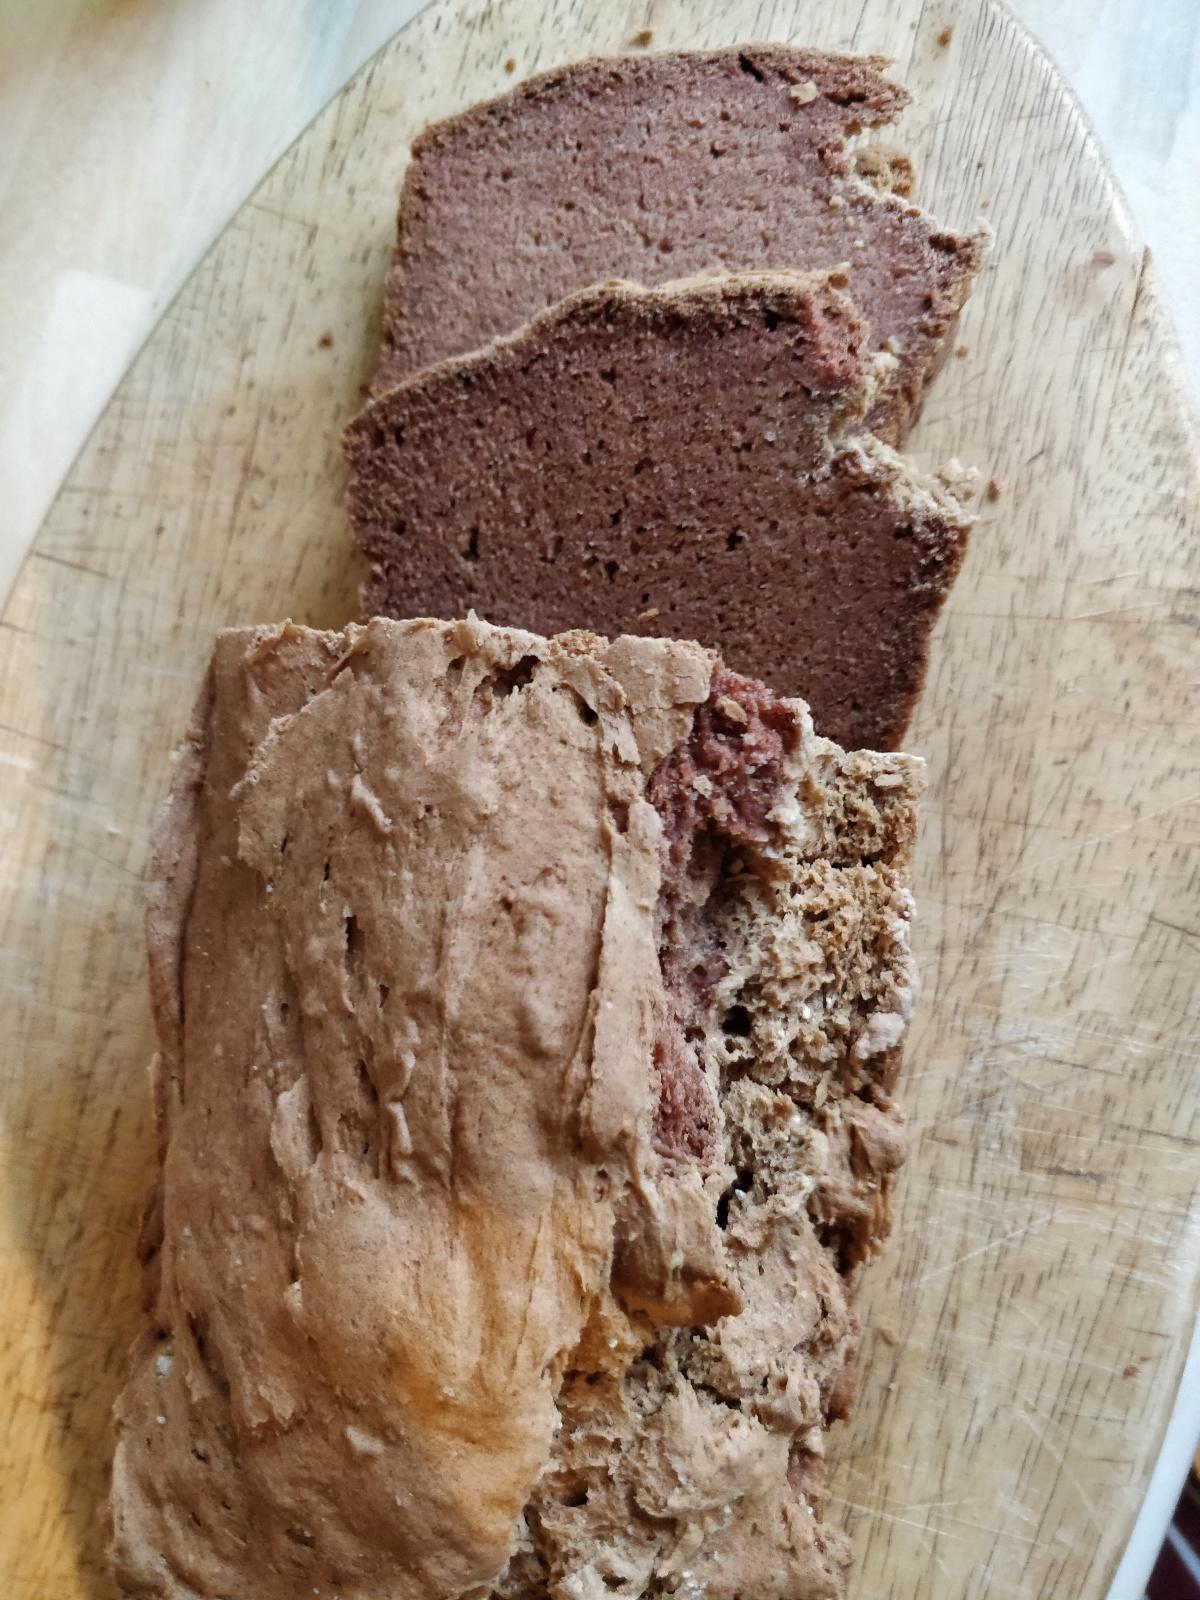 Sugar free flapjacks and bread recipe plus last weeks natural sugarintake.